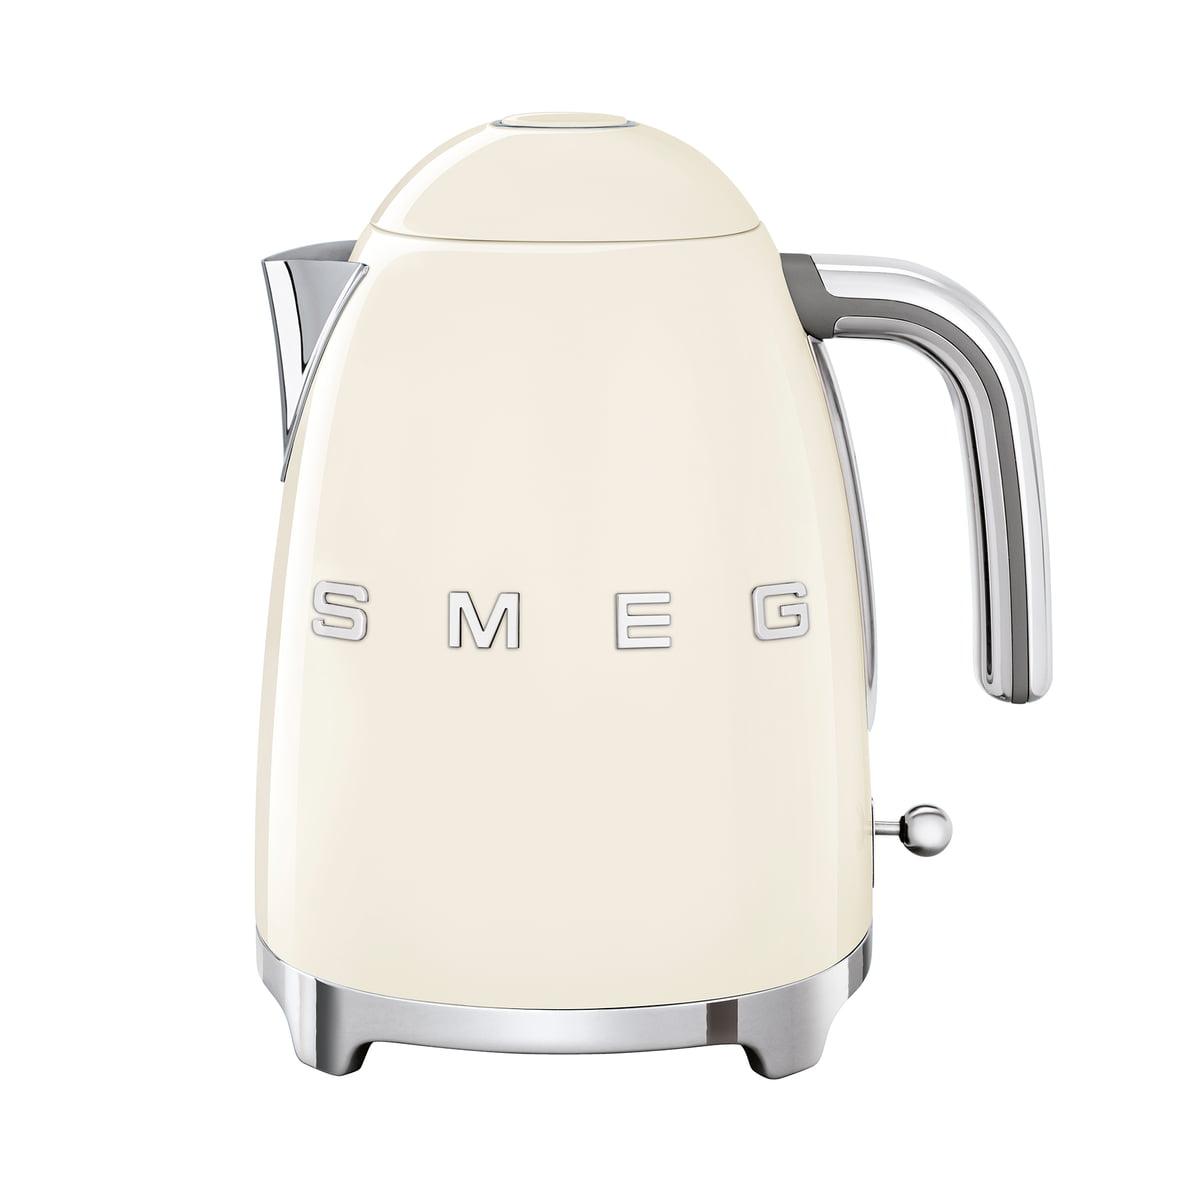 SMEG - Wasserkocher 1,7 l (KLF03), creme